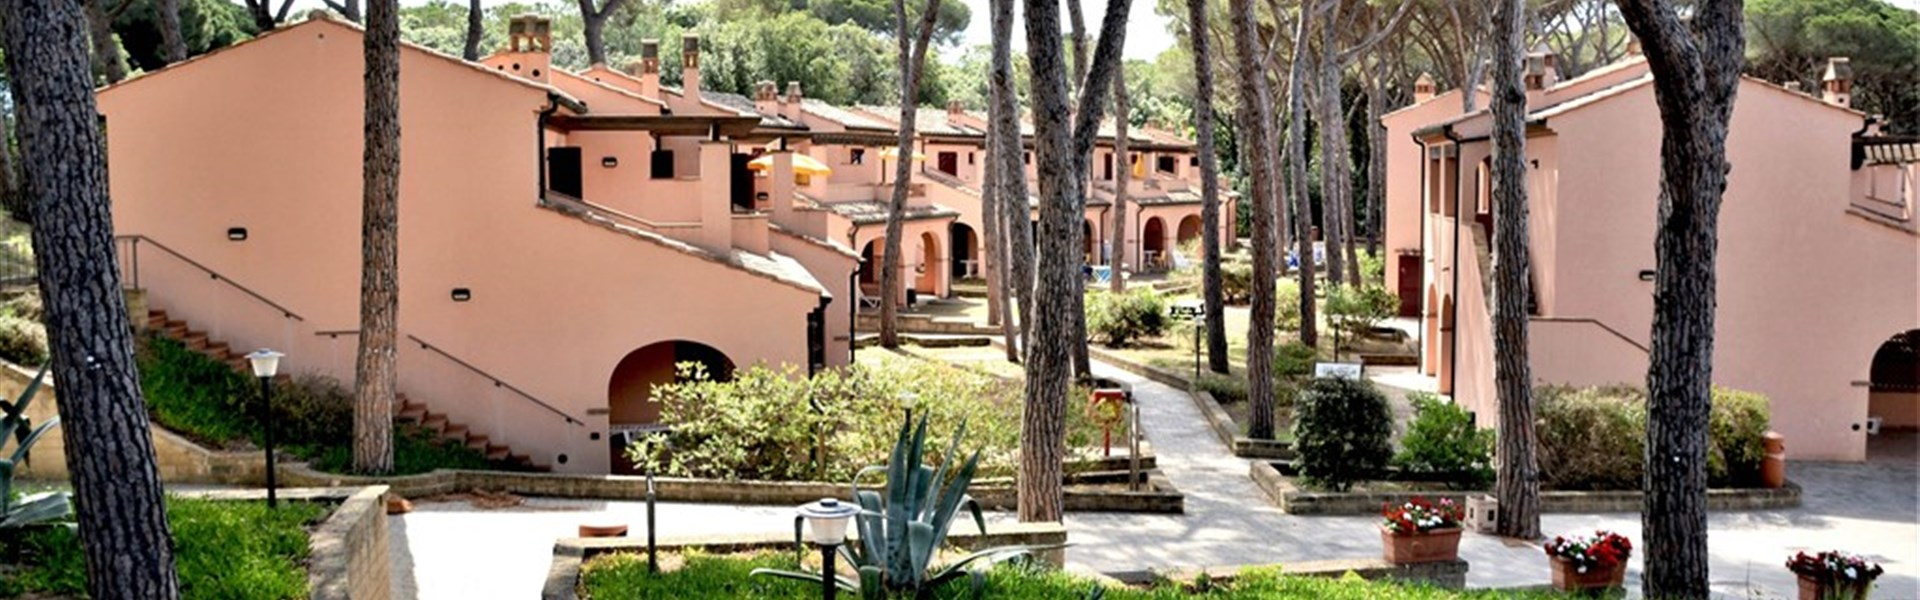 Marco Polo - Residence I Tusci -